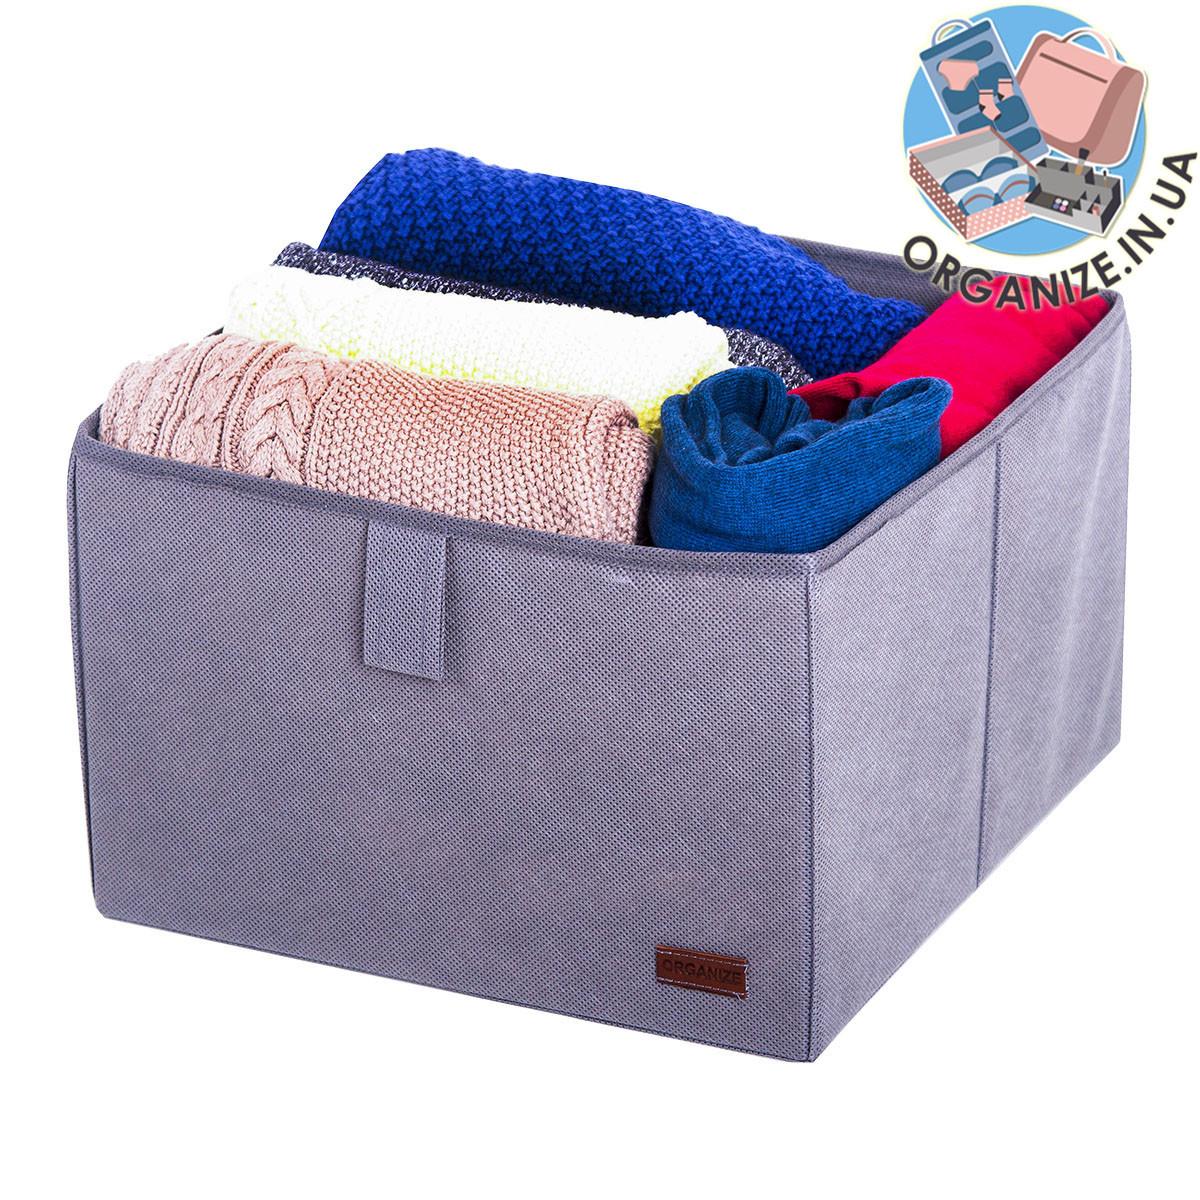 Коробка для хранения вещей L (серый)